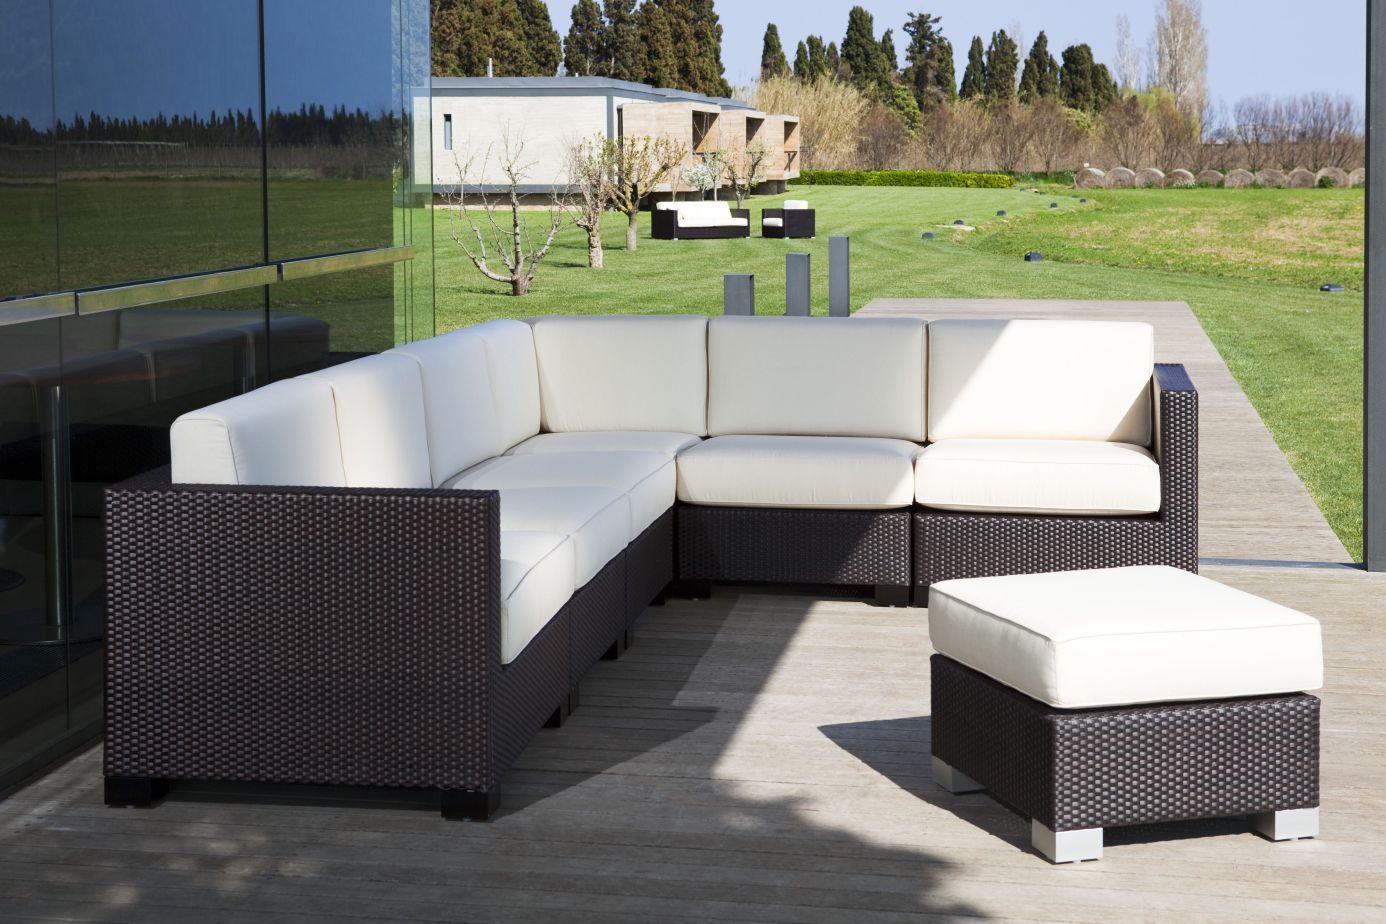 Te Presento Distintos Muebles De Exterior Mesas Sof S Tumbonas  # Muebles Exterior